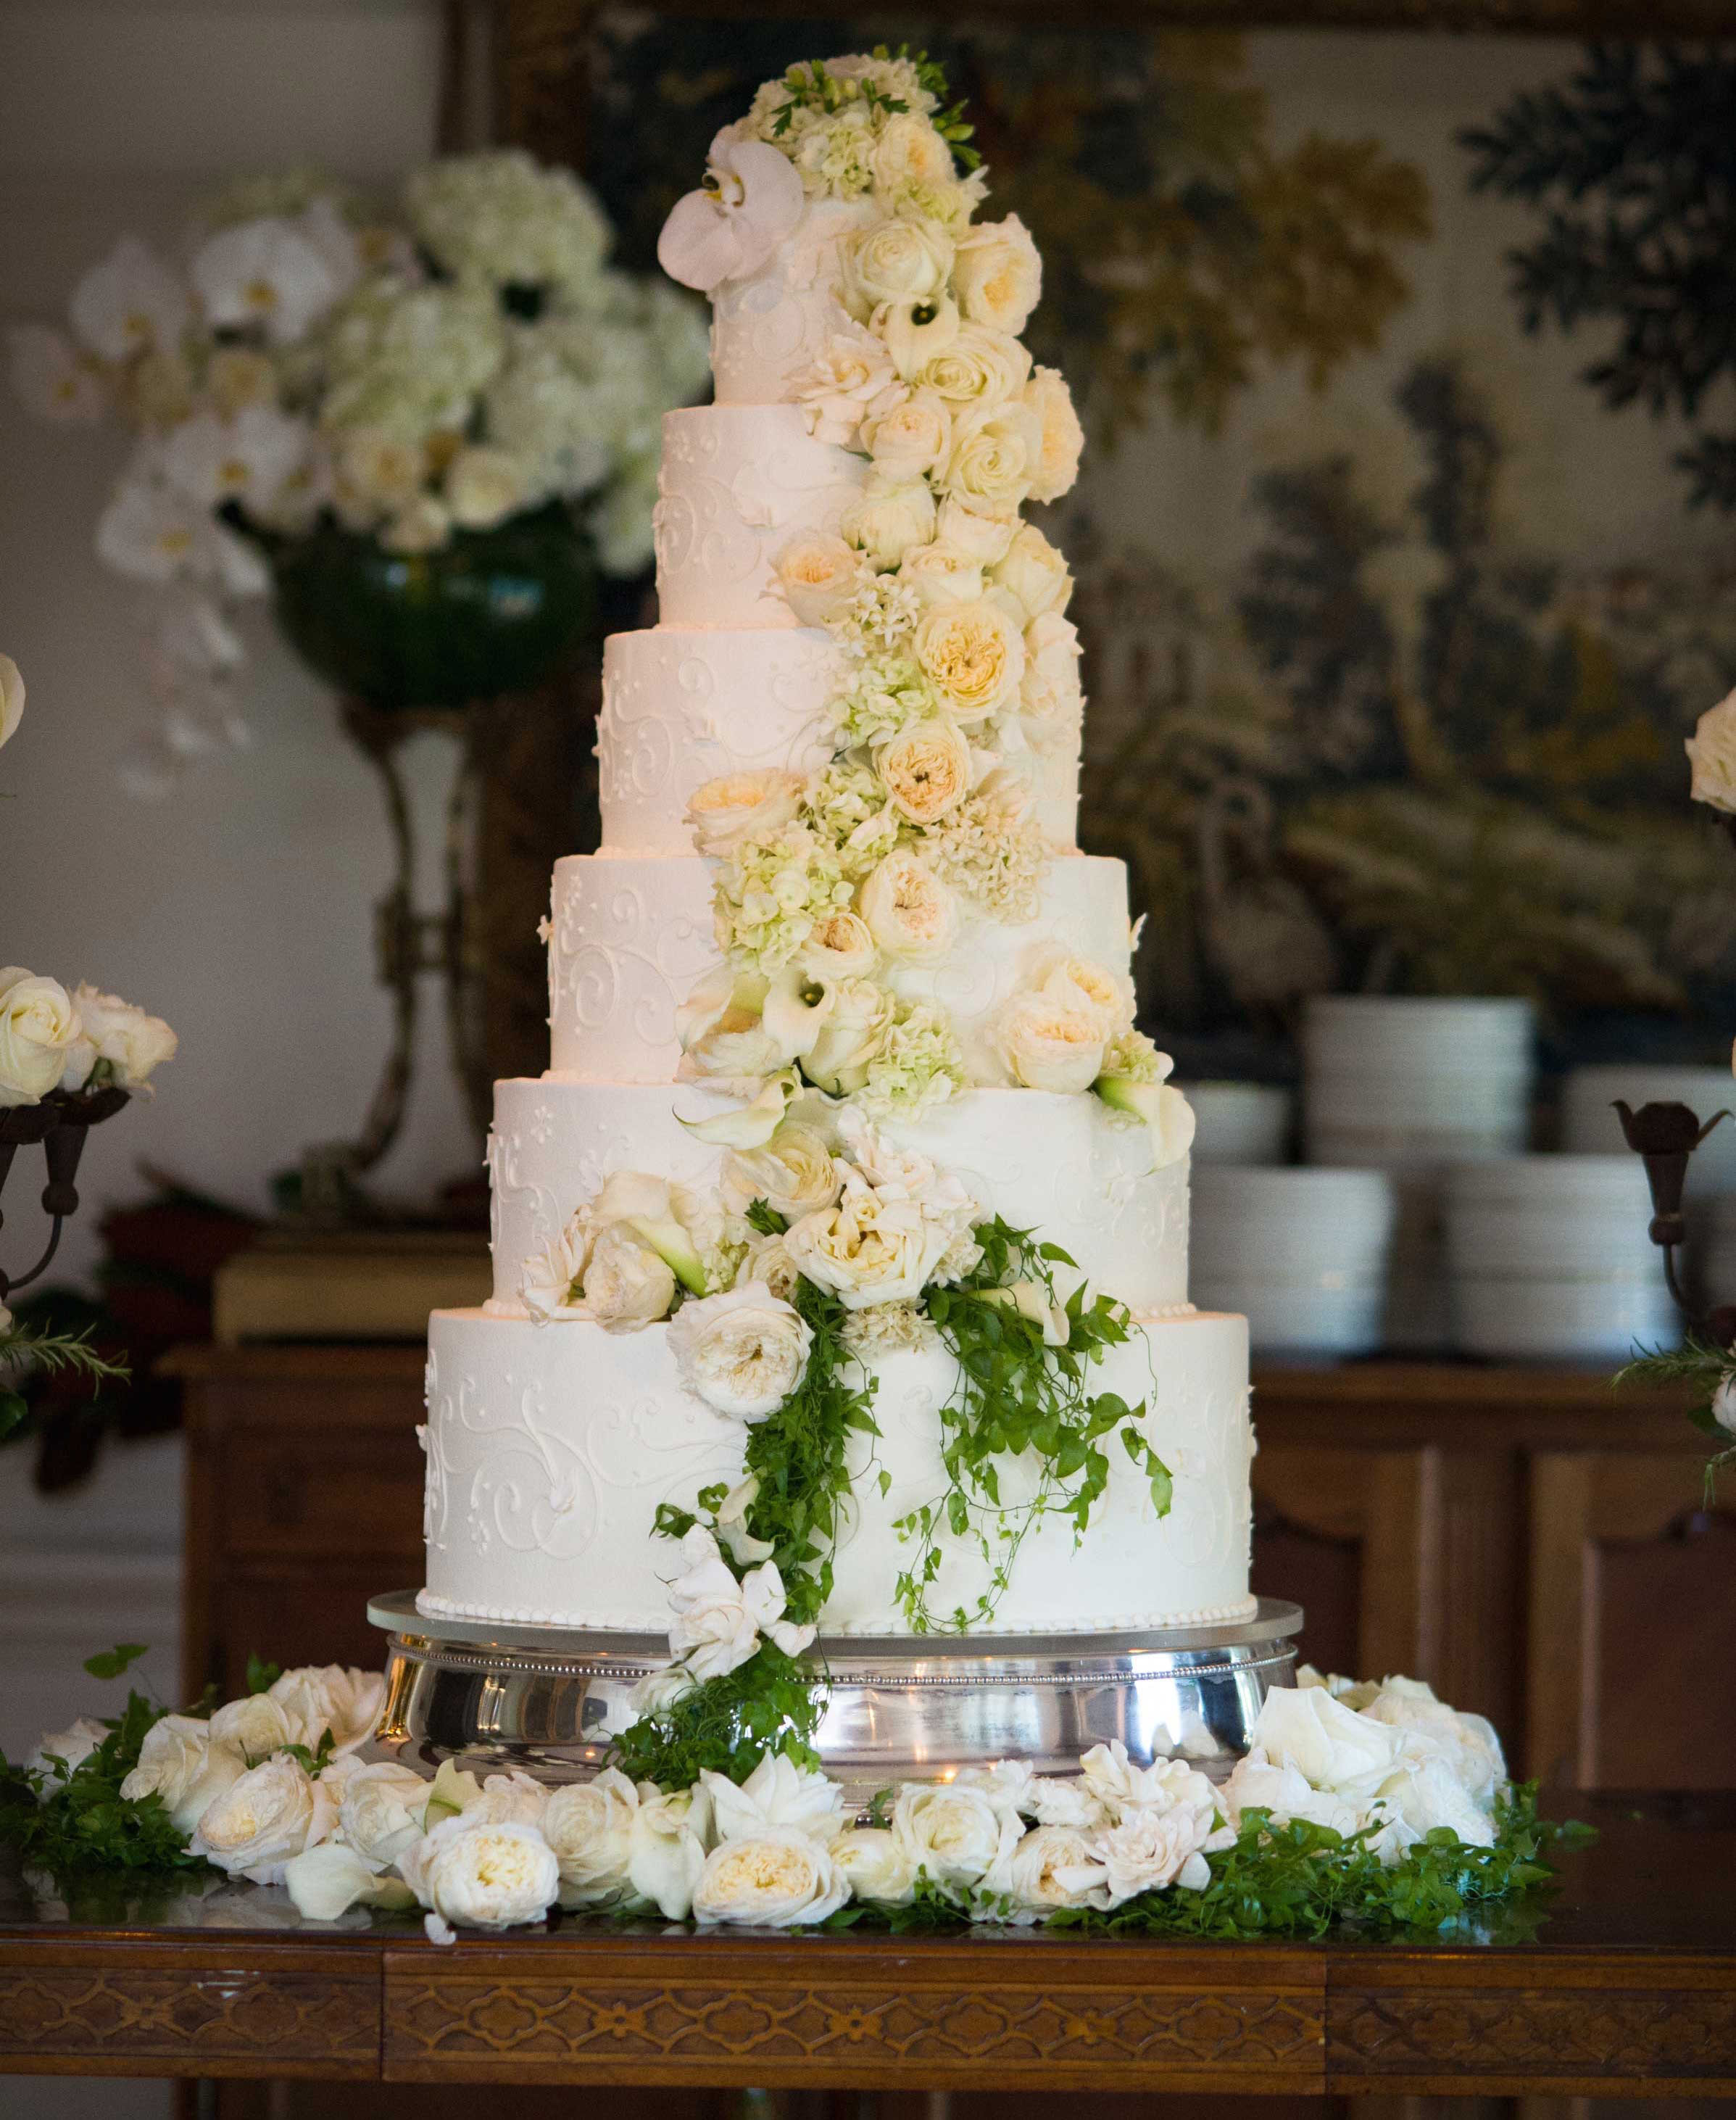 Tall white wedding cake with fresh white flowers